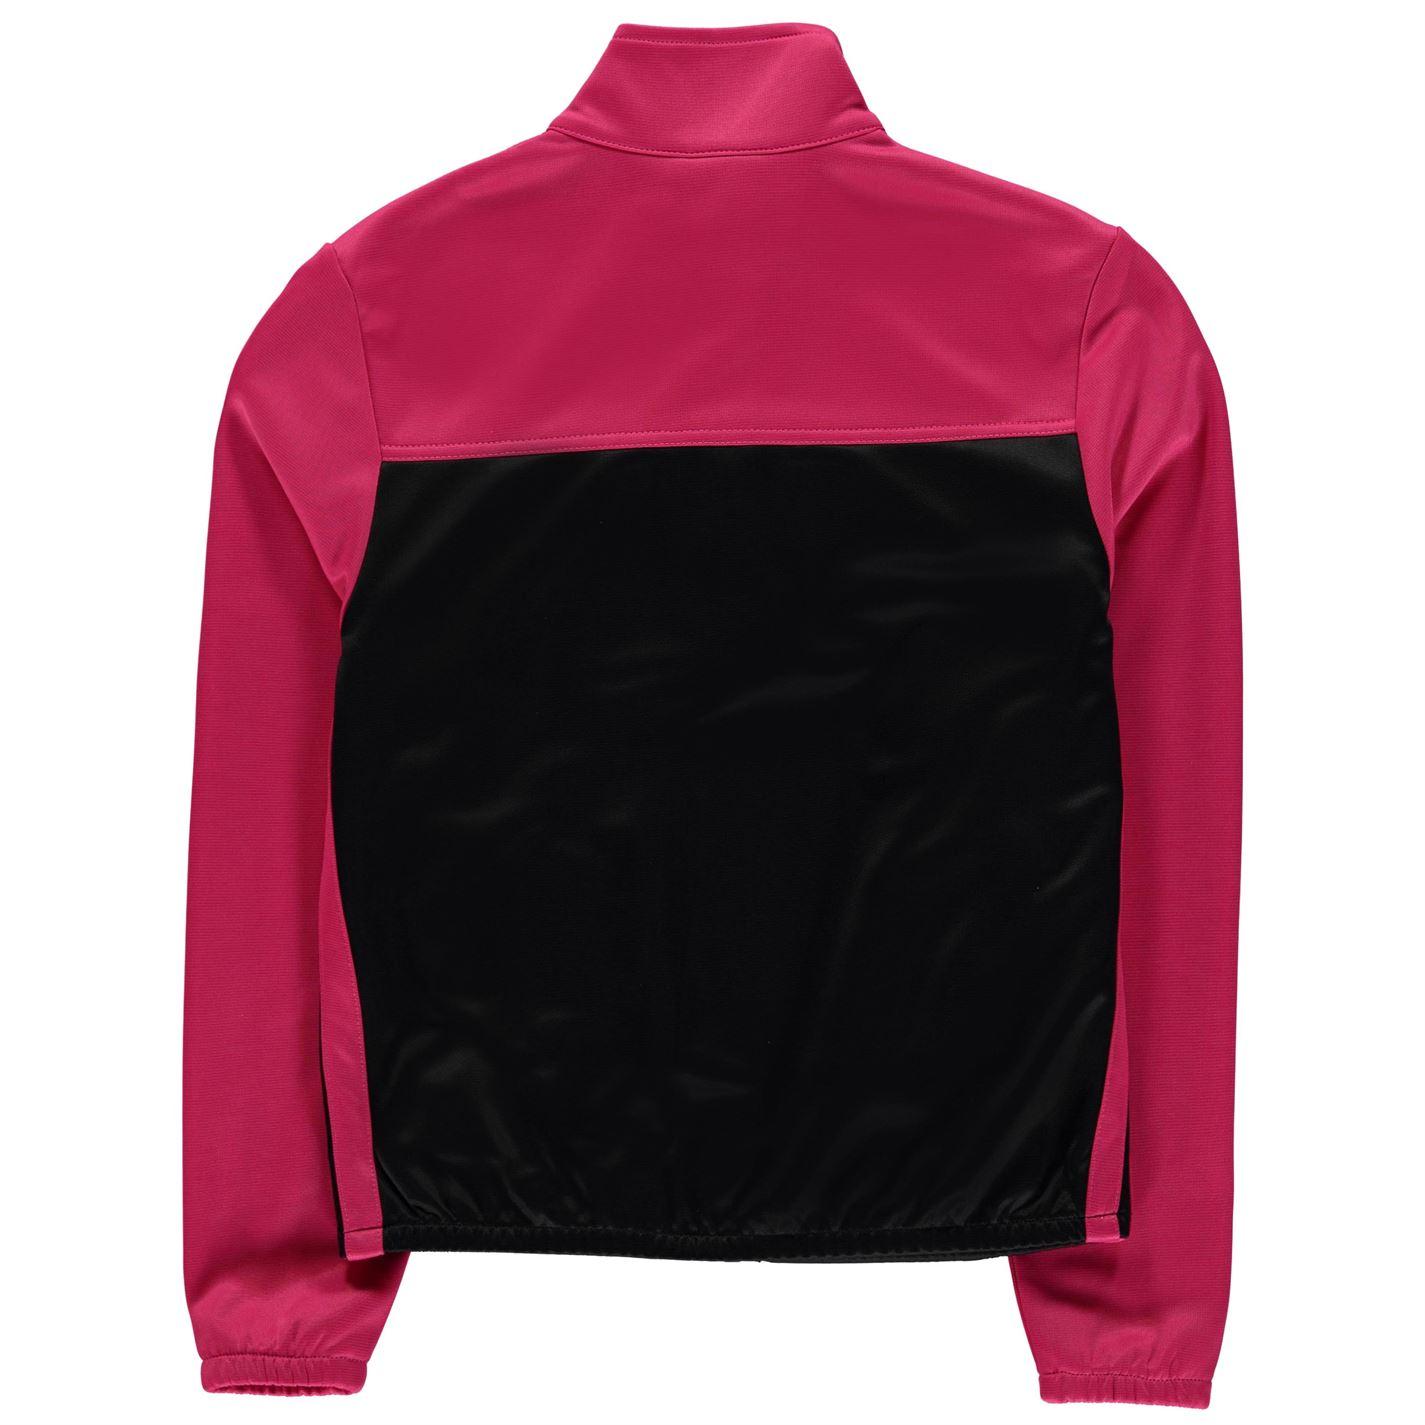 Lonsdale 2 Stripe Track Giacca Giovane Ragazze Tuta Da Ginnastica Top Coat CHIN GUARD